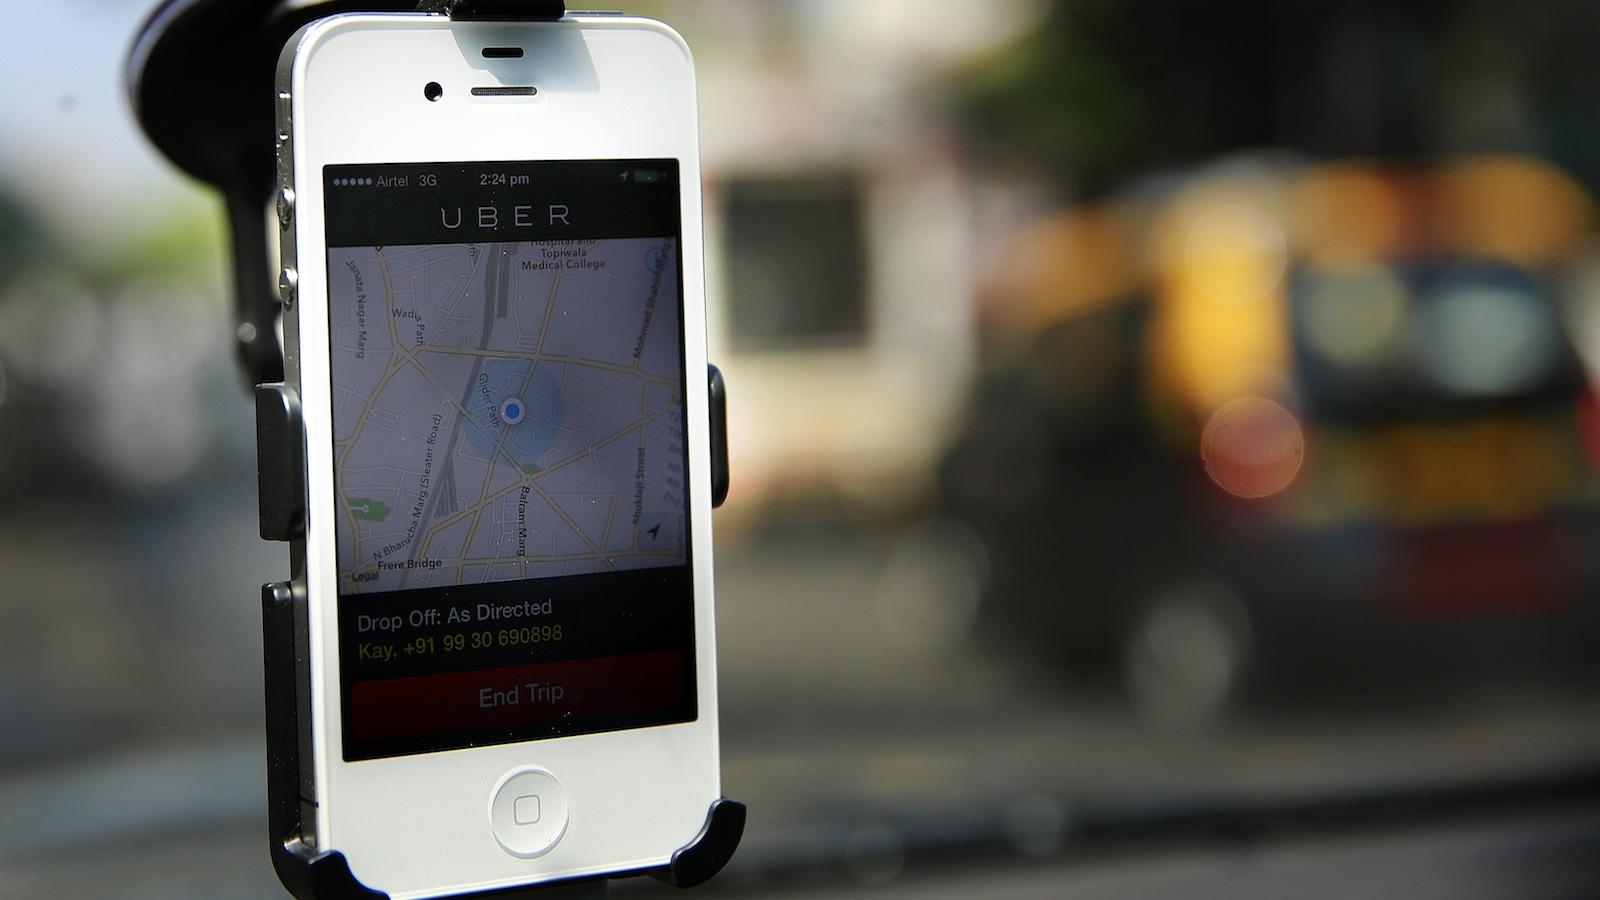 Uber-New Delhi